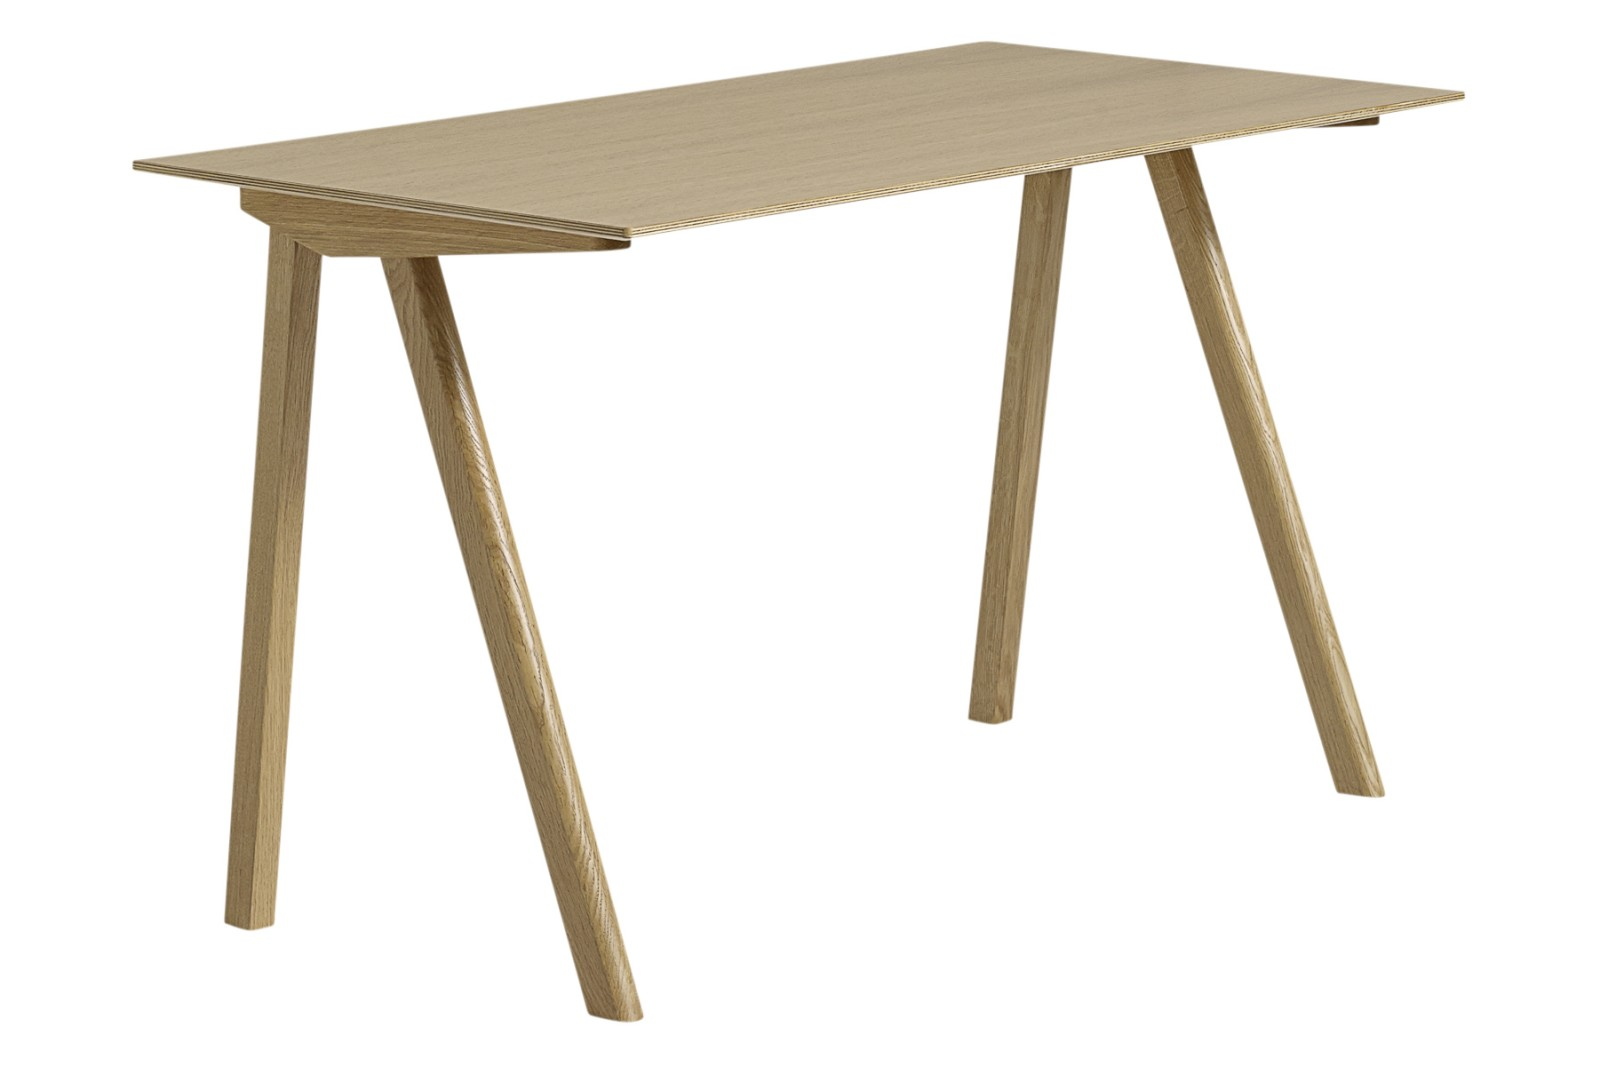 Copenhague Linoleum Top Desk CPH90 Clear Lacquered Solid Oak Base, Clear Lacquered Oak Veneer Top